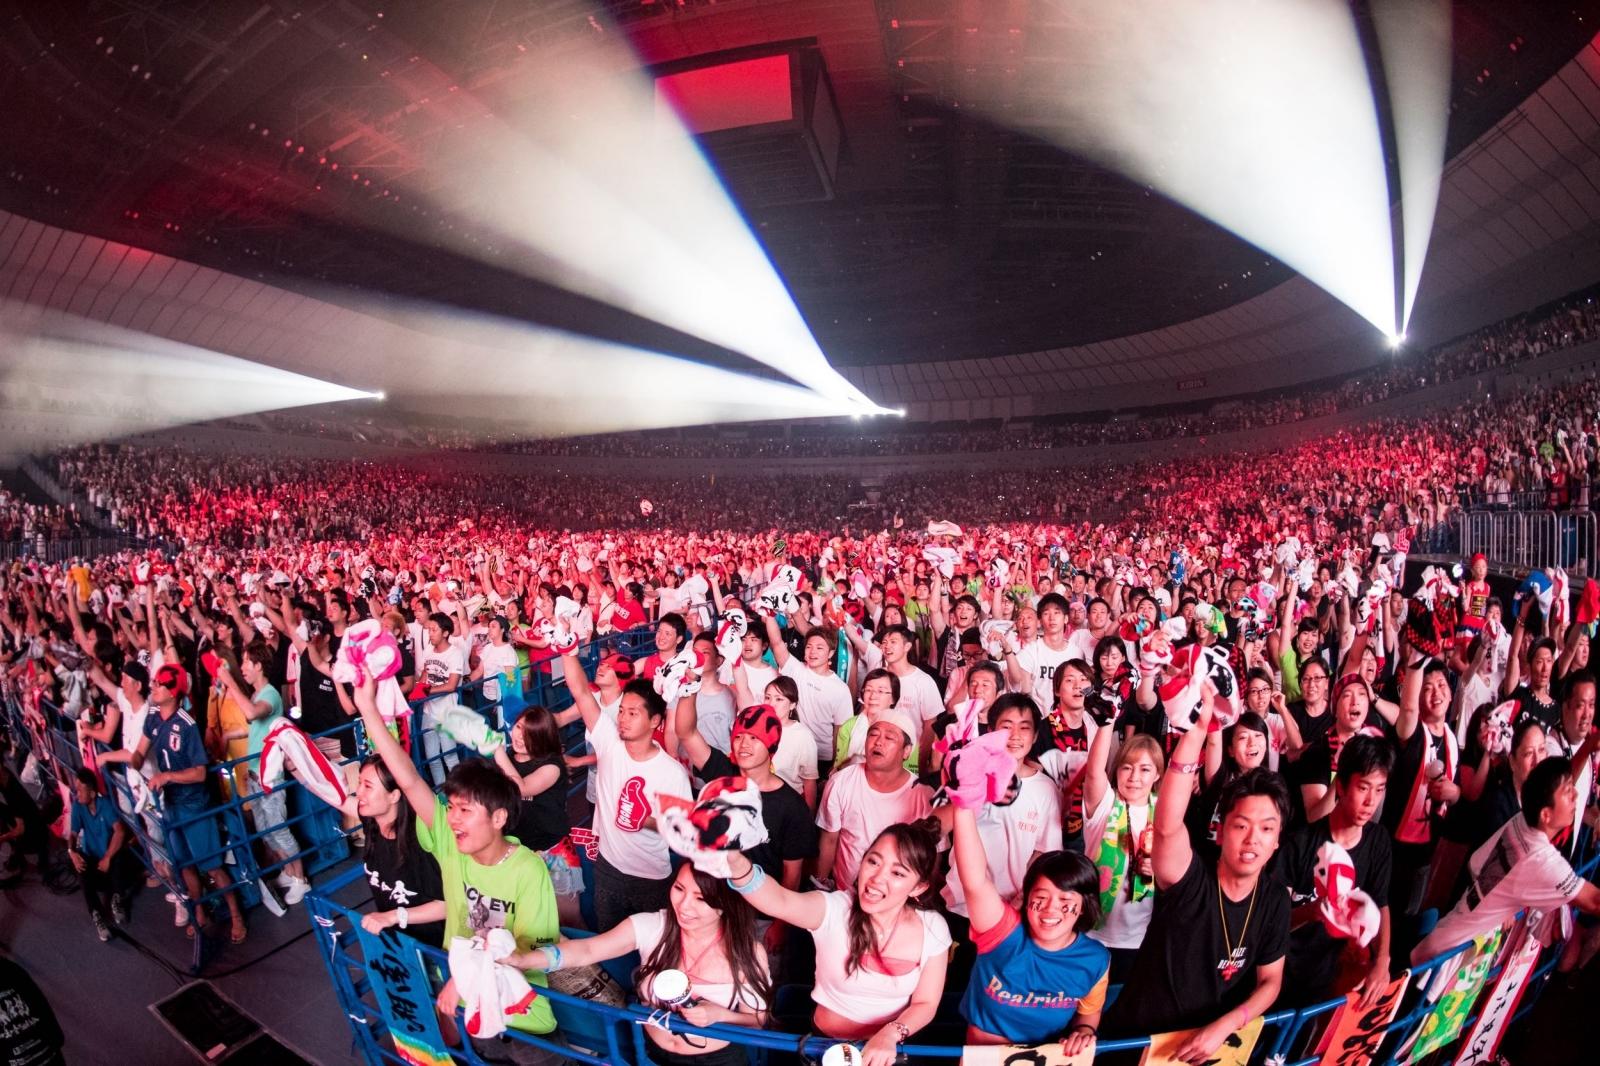 湘南乃風『風伝説 ~一五一会 TOUR2018~』横浜アリーナ